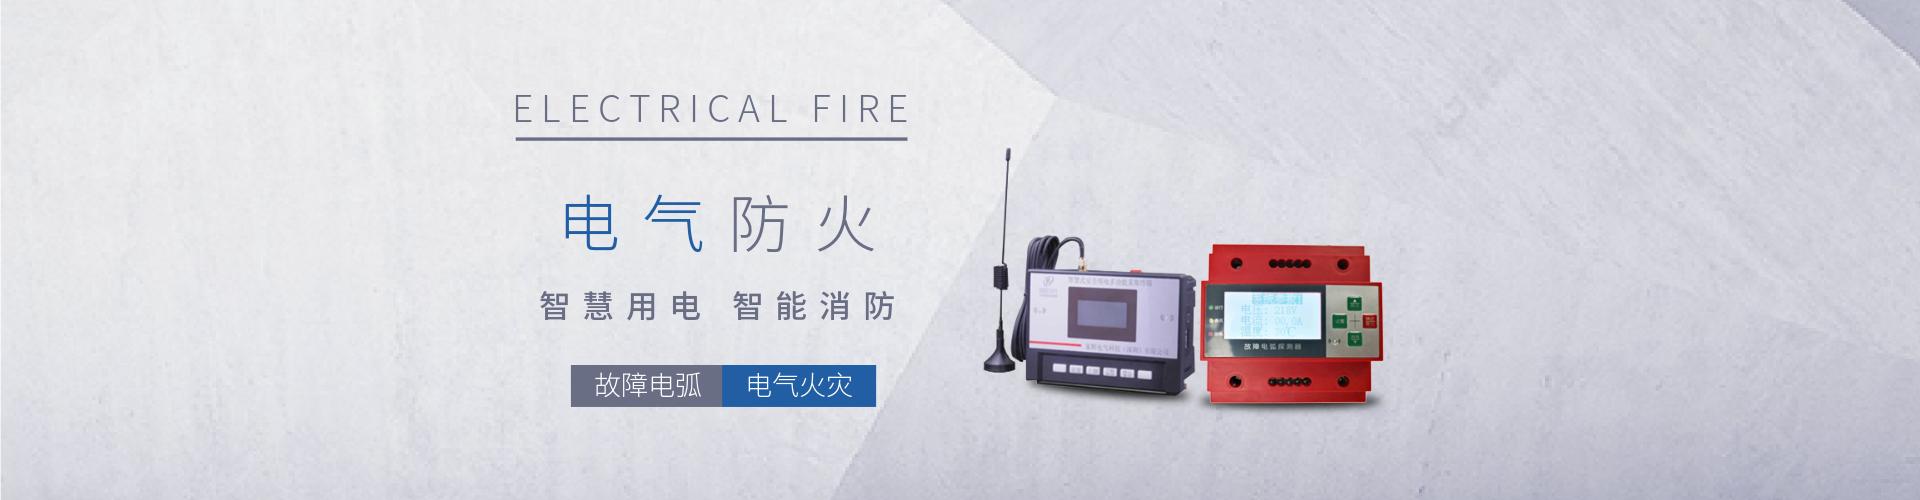 深圳电气火灾探测器